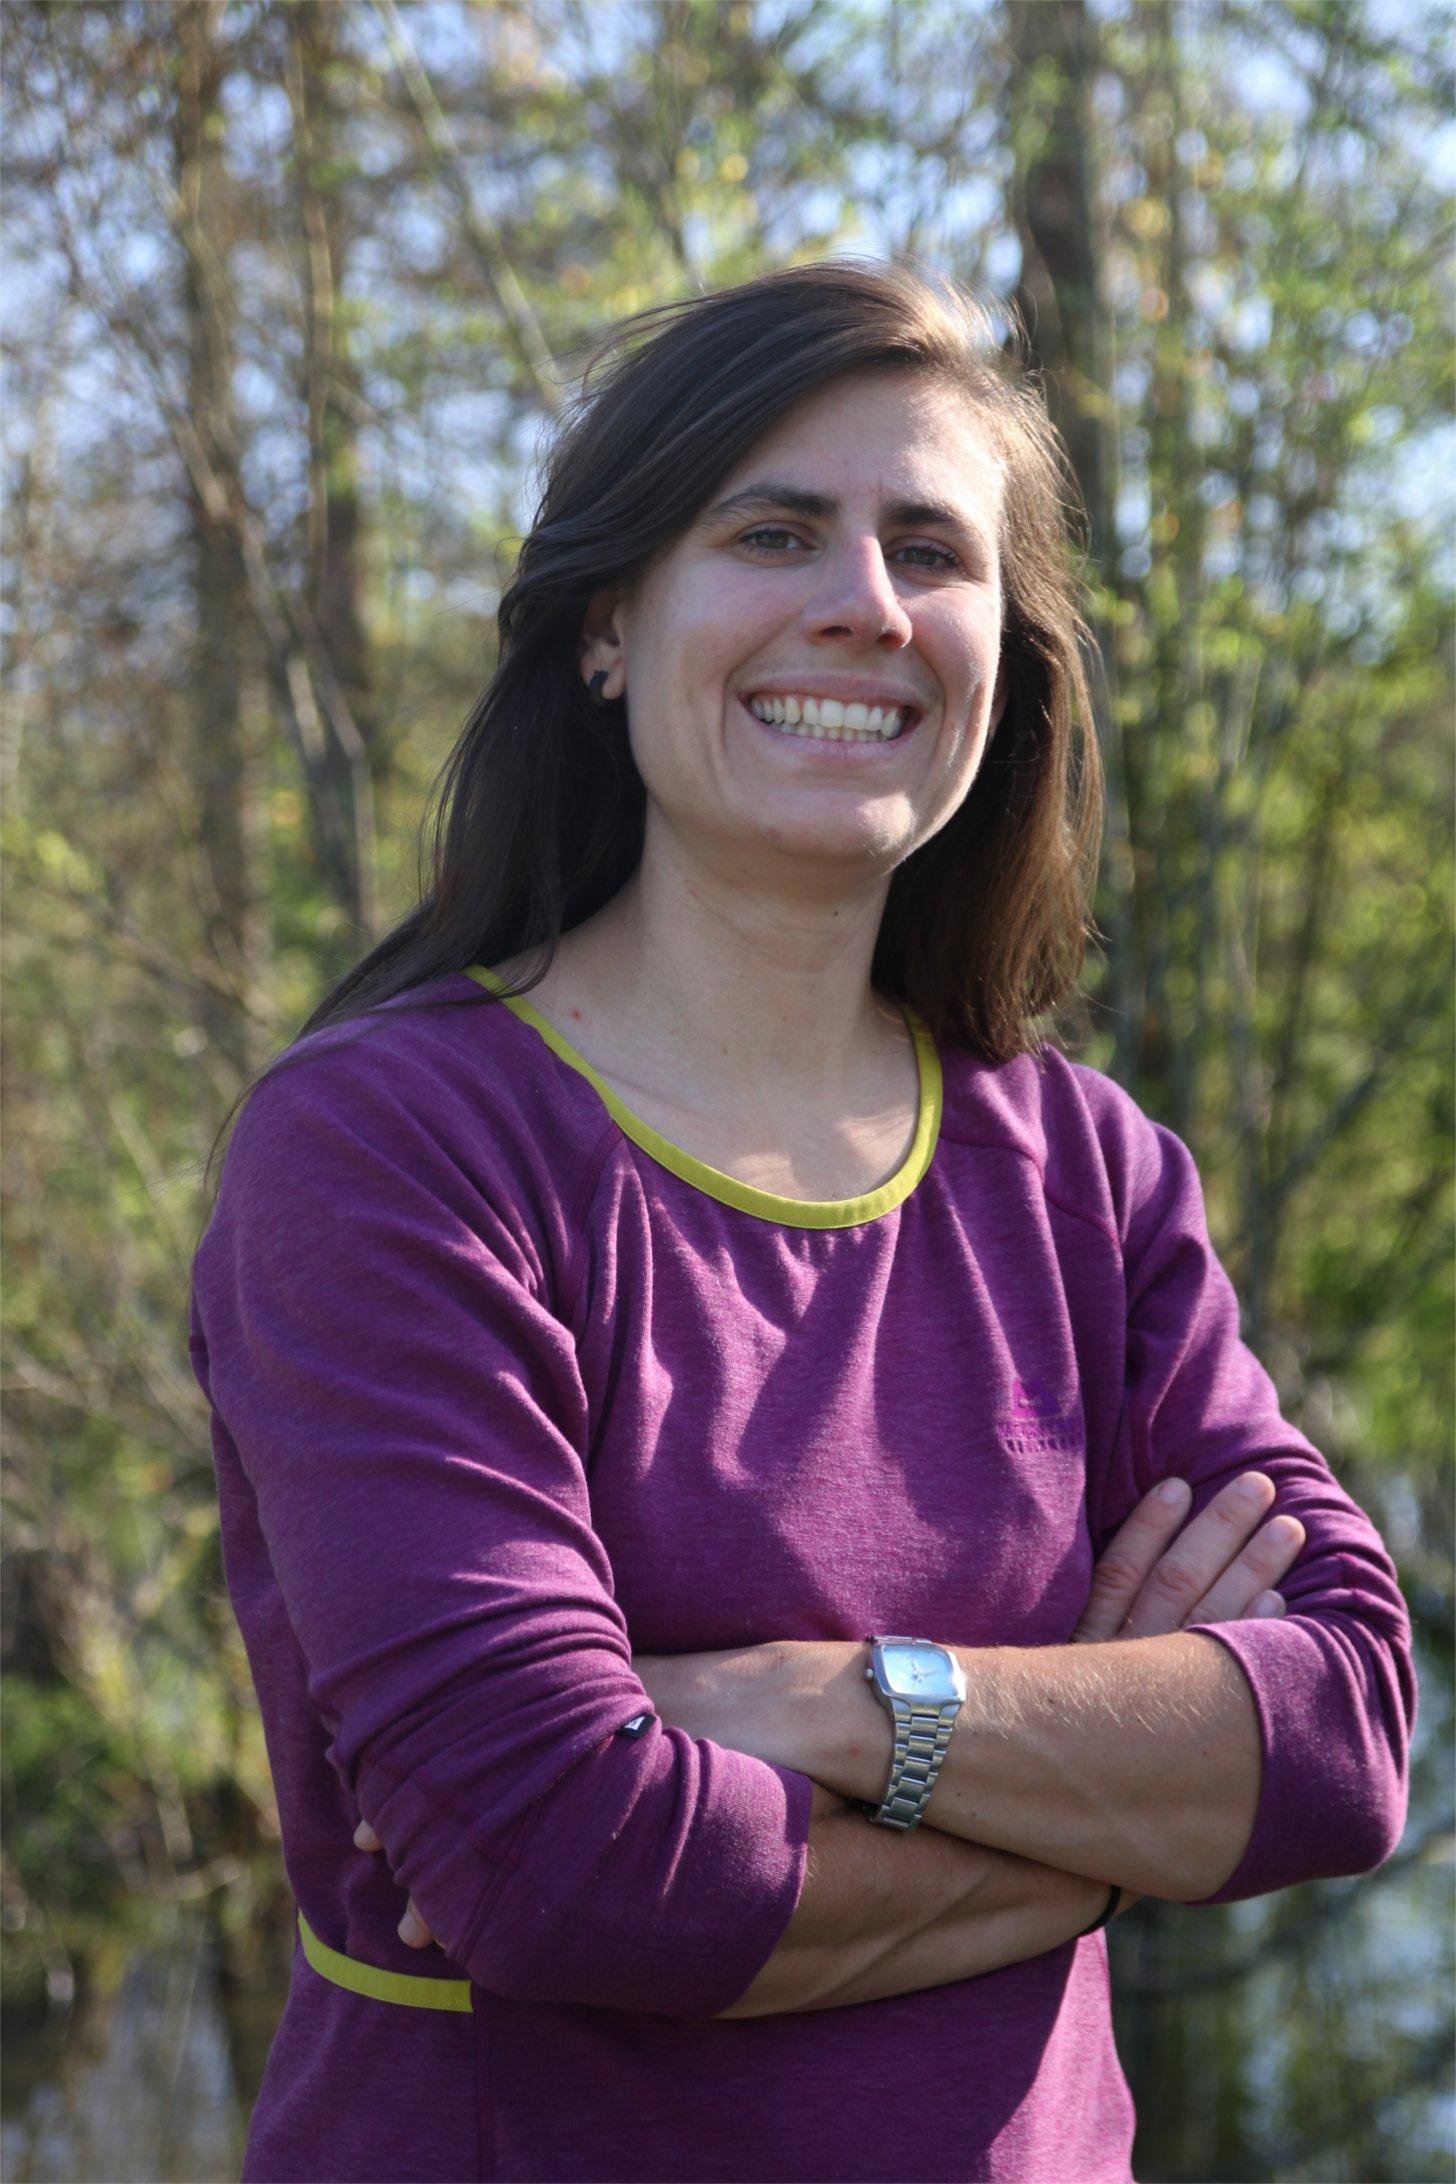 Claudia Klingelhöfer